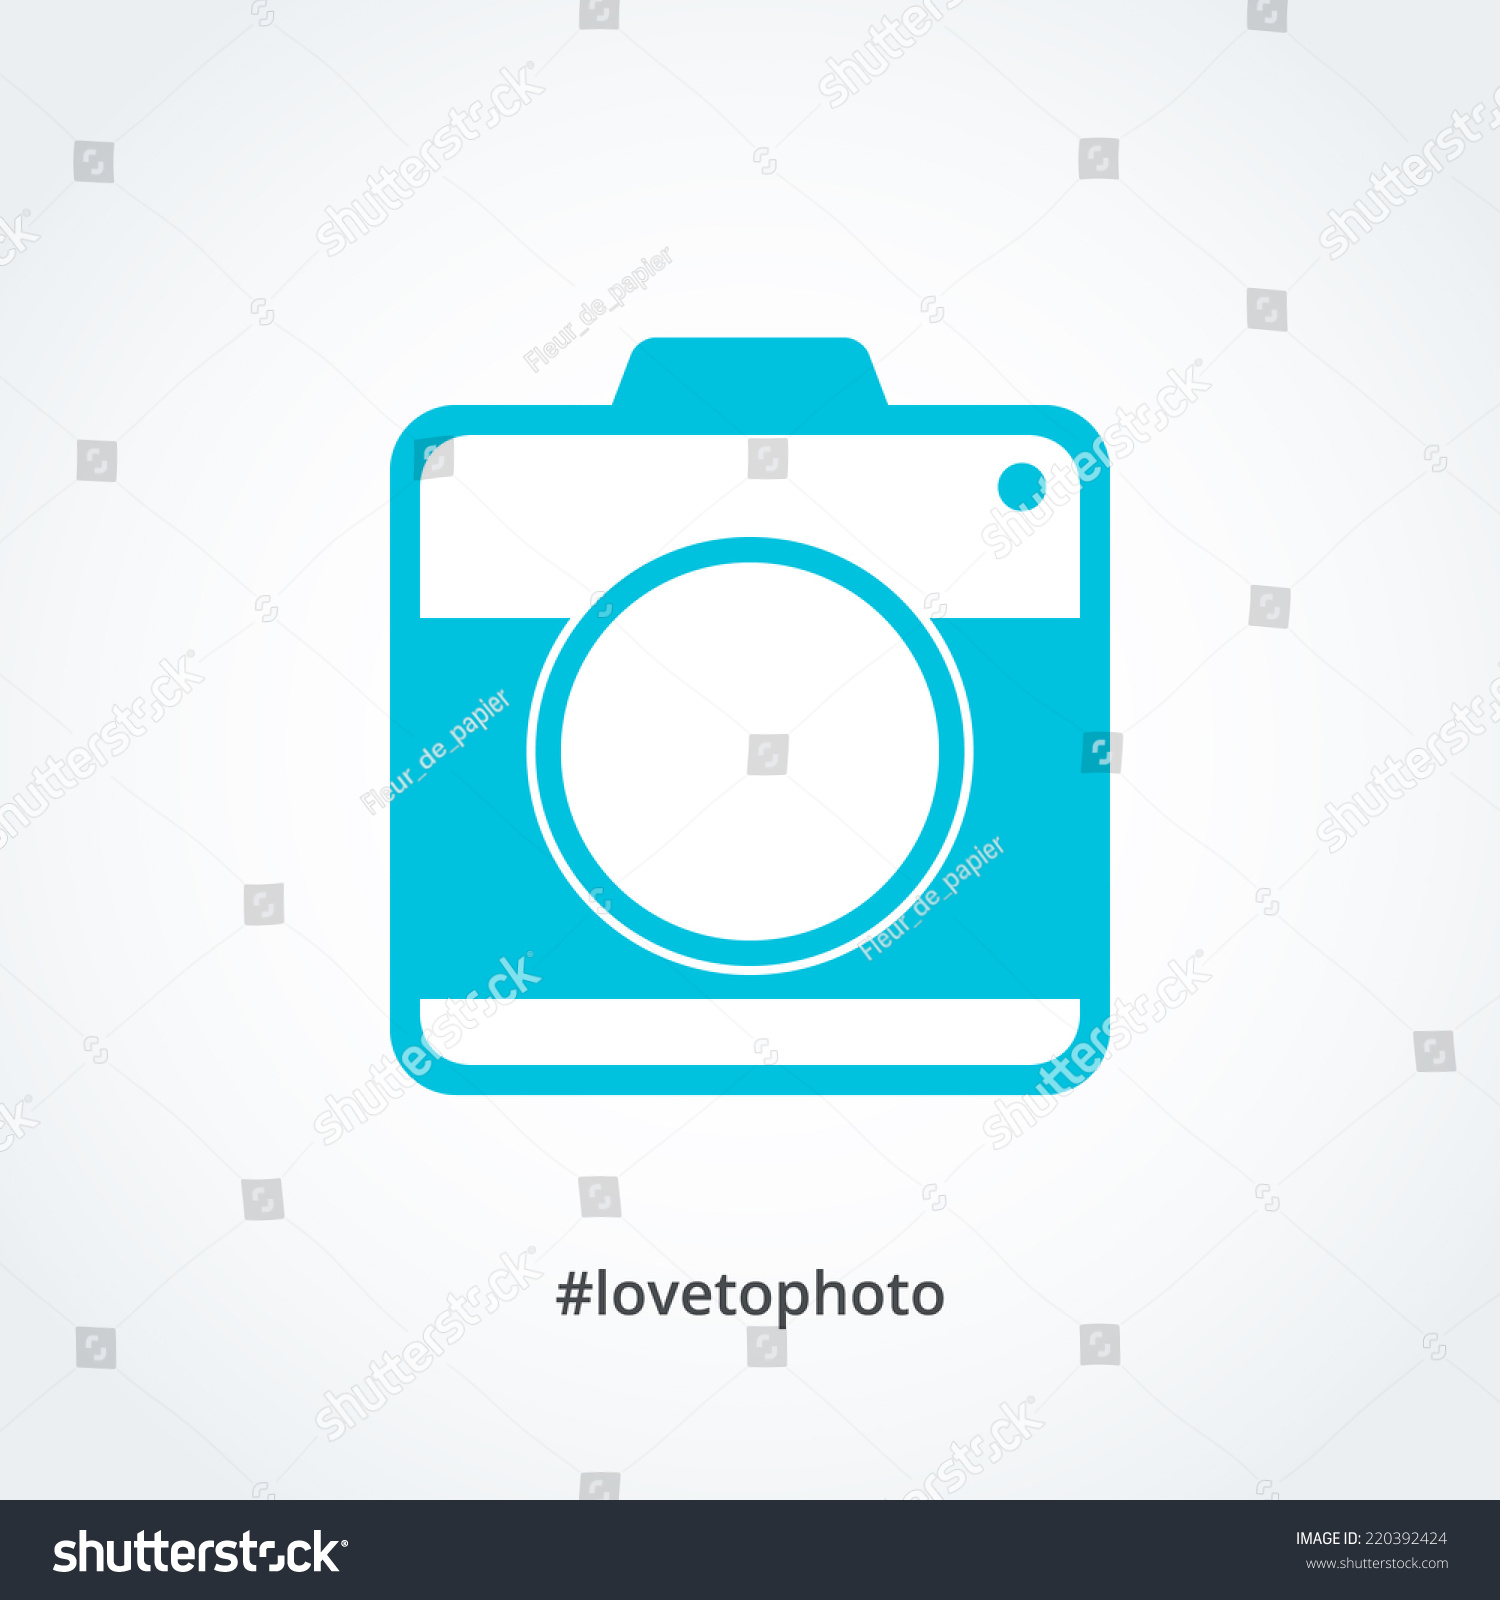 Vector Illustration Instagram: Abstract Instagram Camera Icon Vector Editable Stock